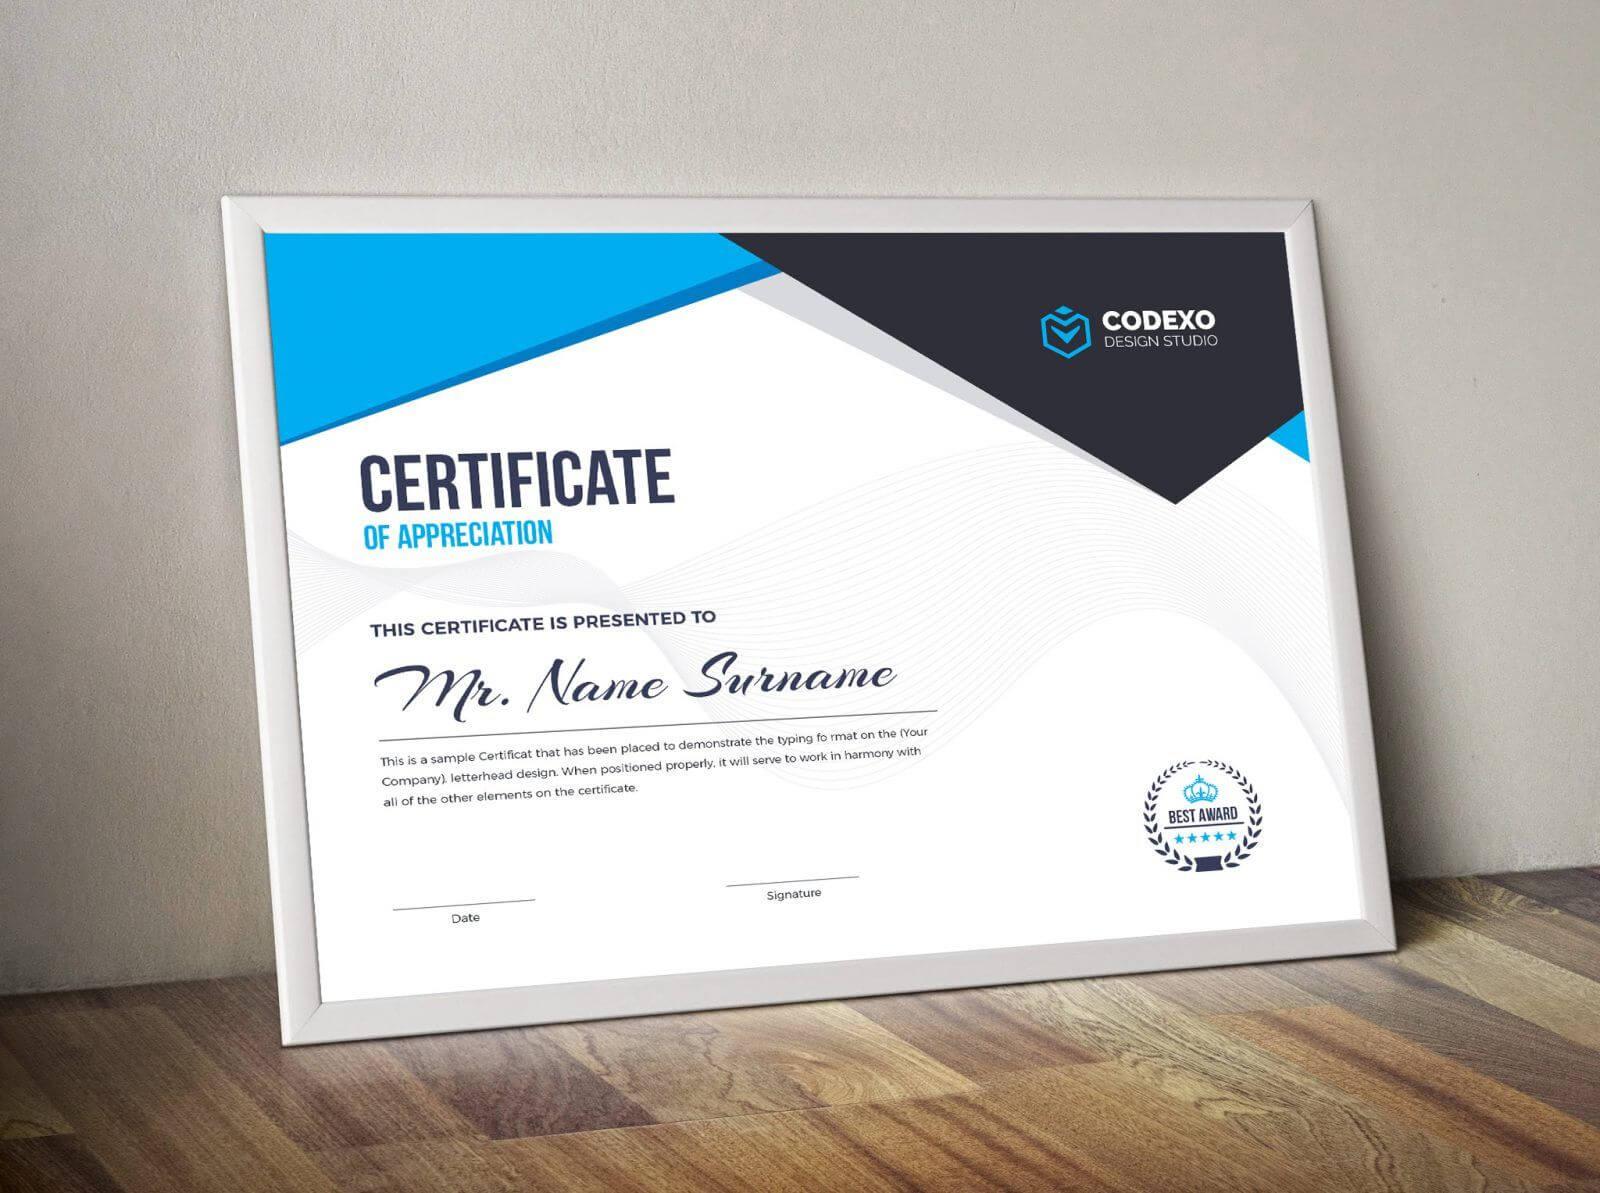 Nemesis Professional Landscape Certificate Template 000847 Intended For Landscape Certificate Templates